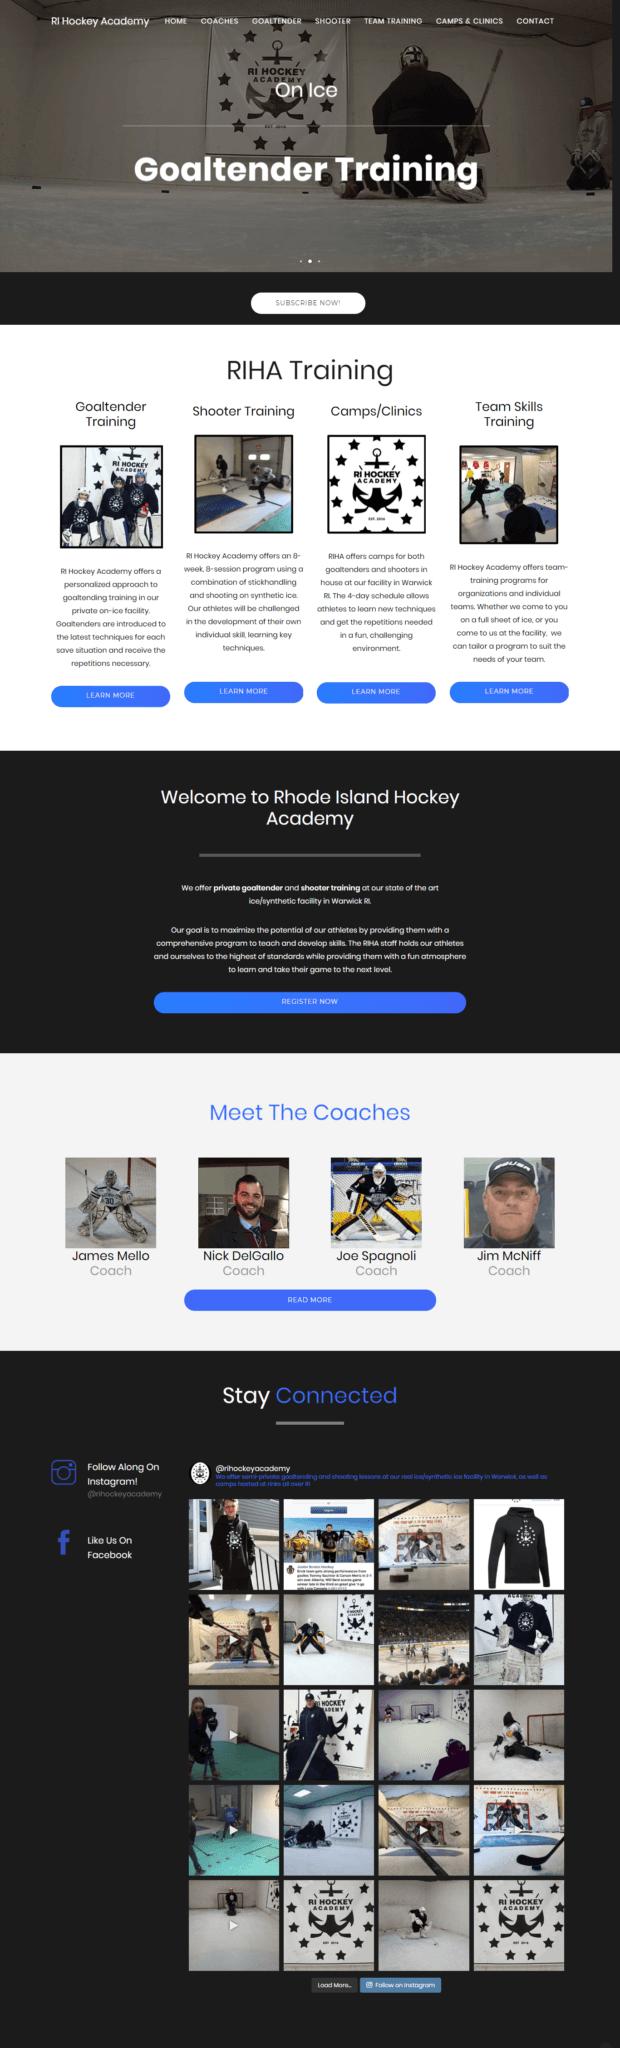 RIHockeyAcademy